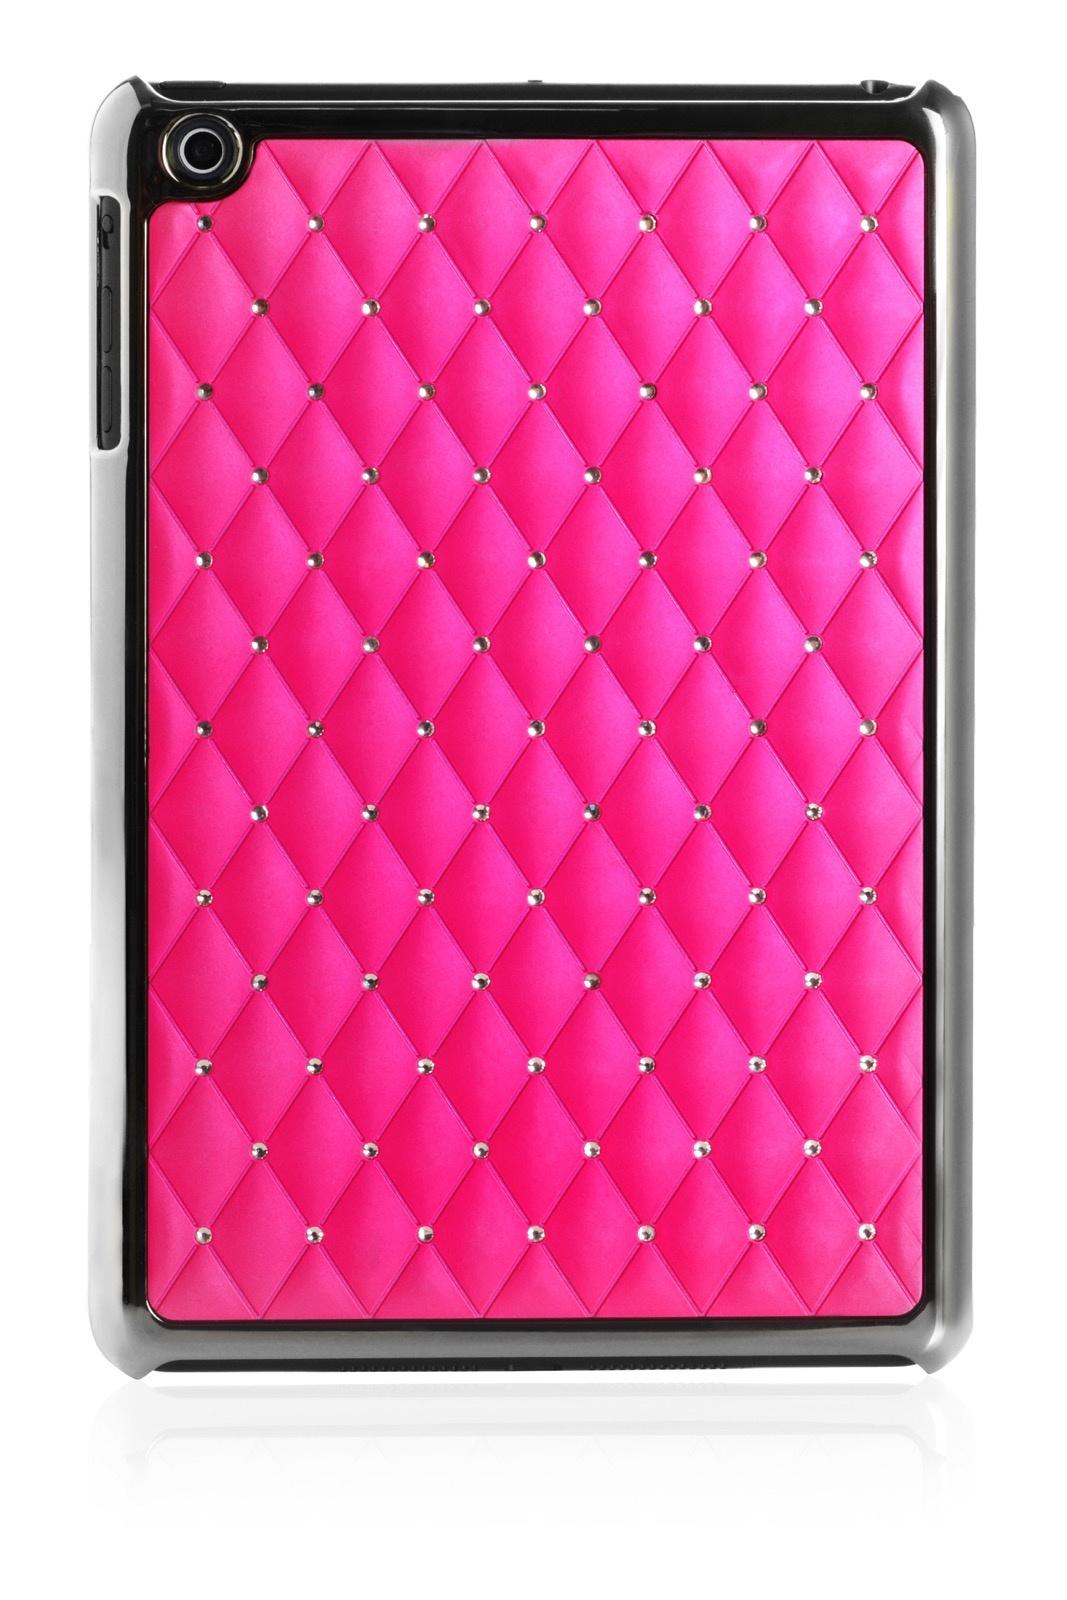 Чехол для планшета iNeez накладка стежка с кристаллами 410153 Apple iPad mini 7.9, темно-розовый